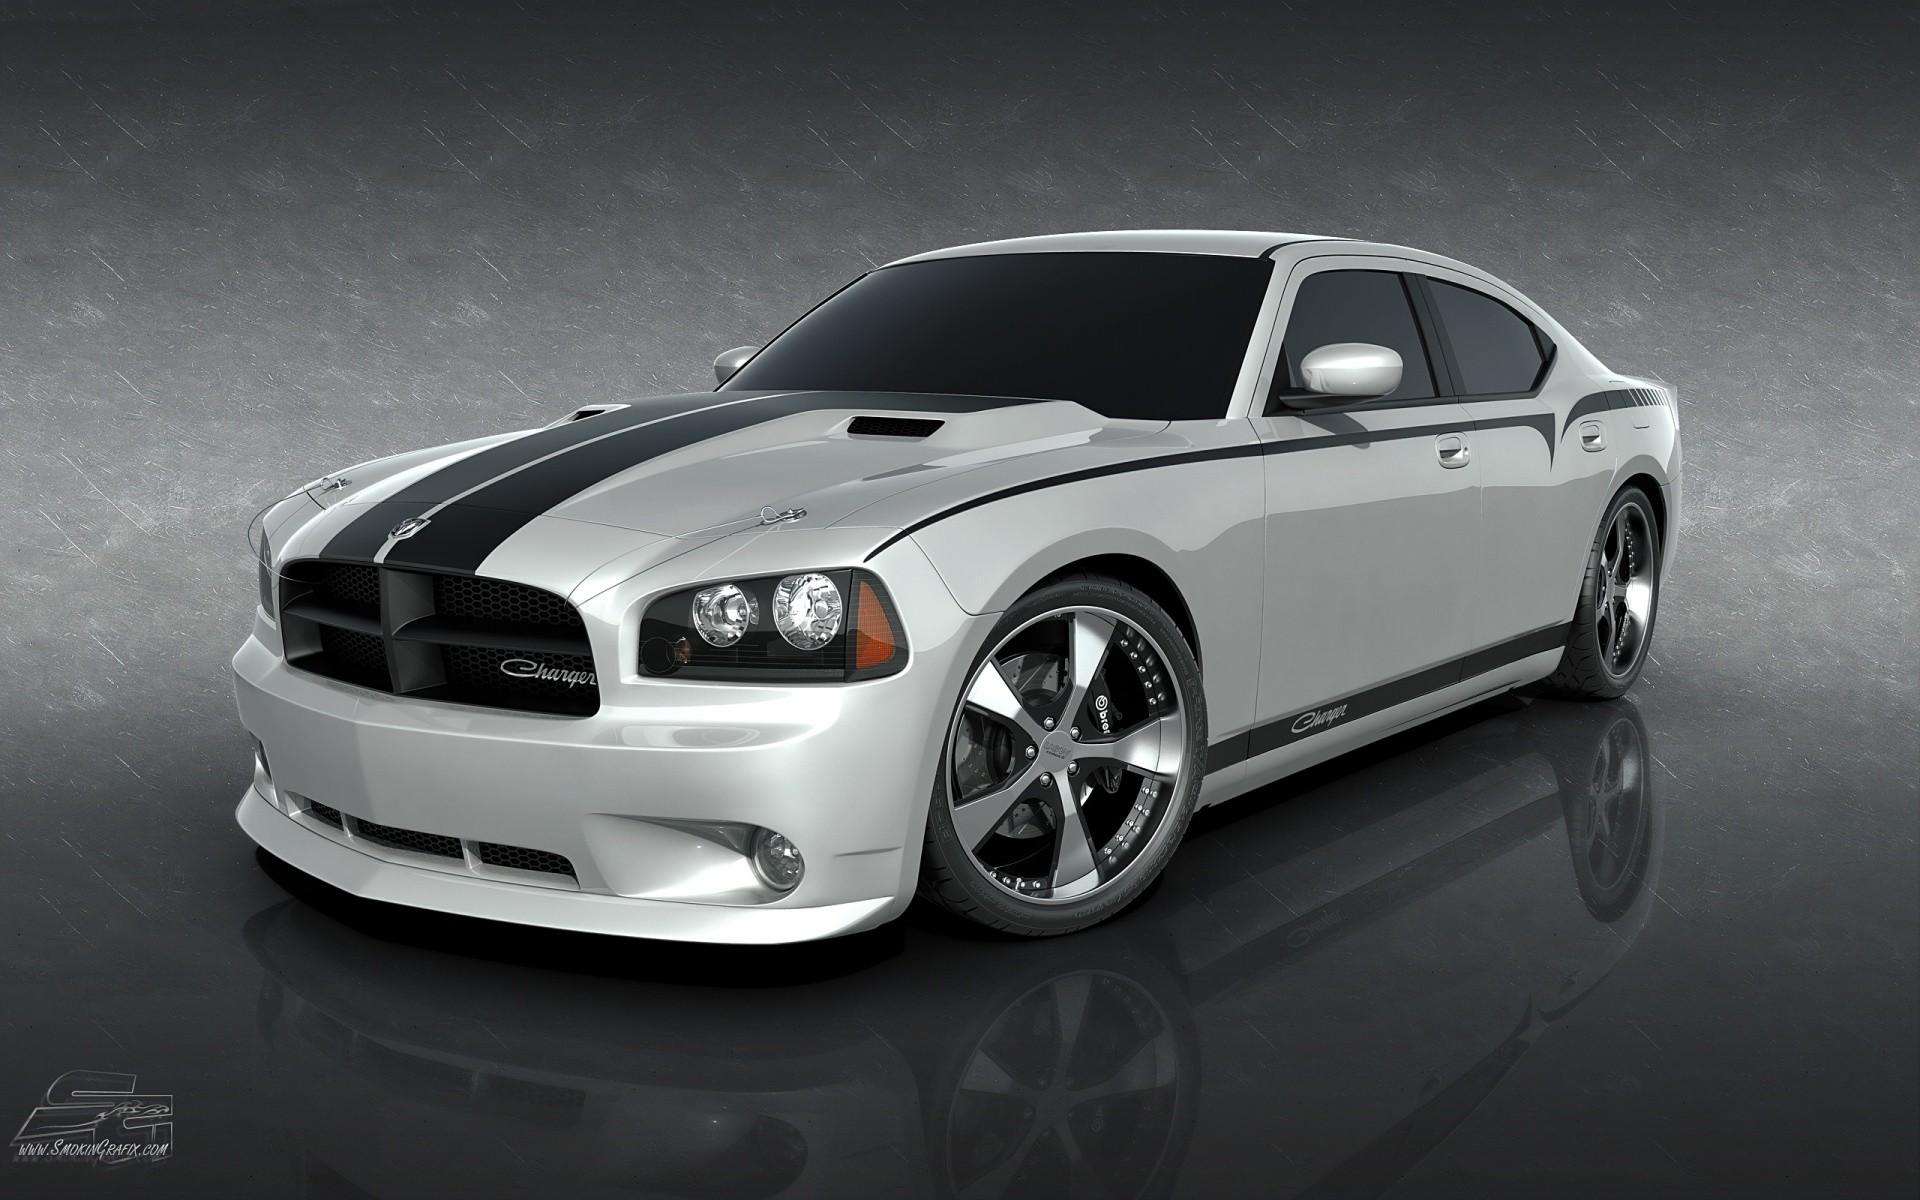 dodge, charger, wallpaper, desktop, muscle car, auto wallpaper